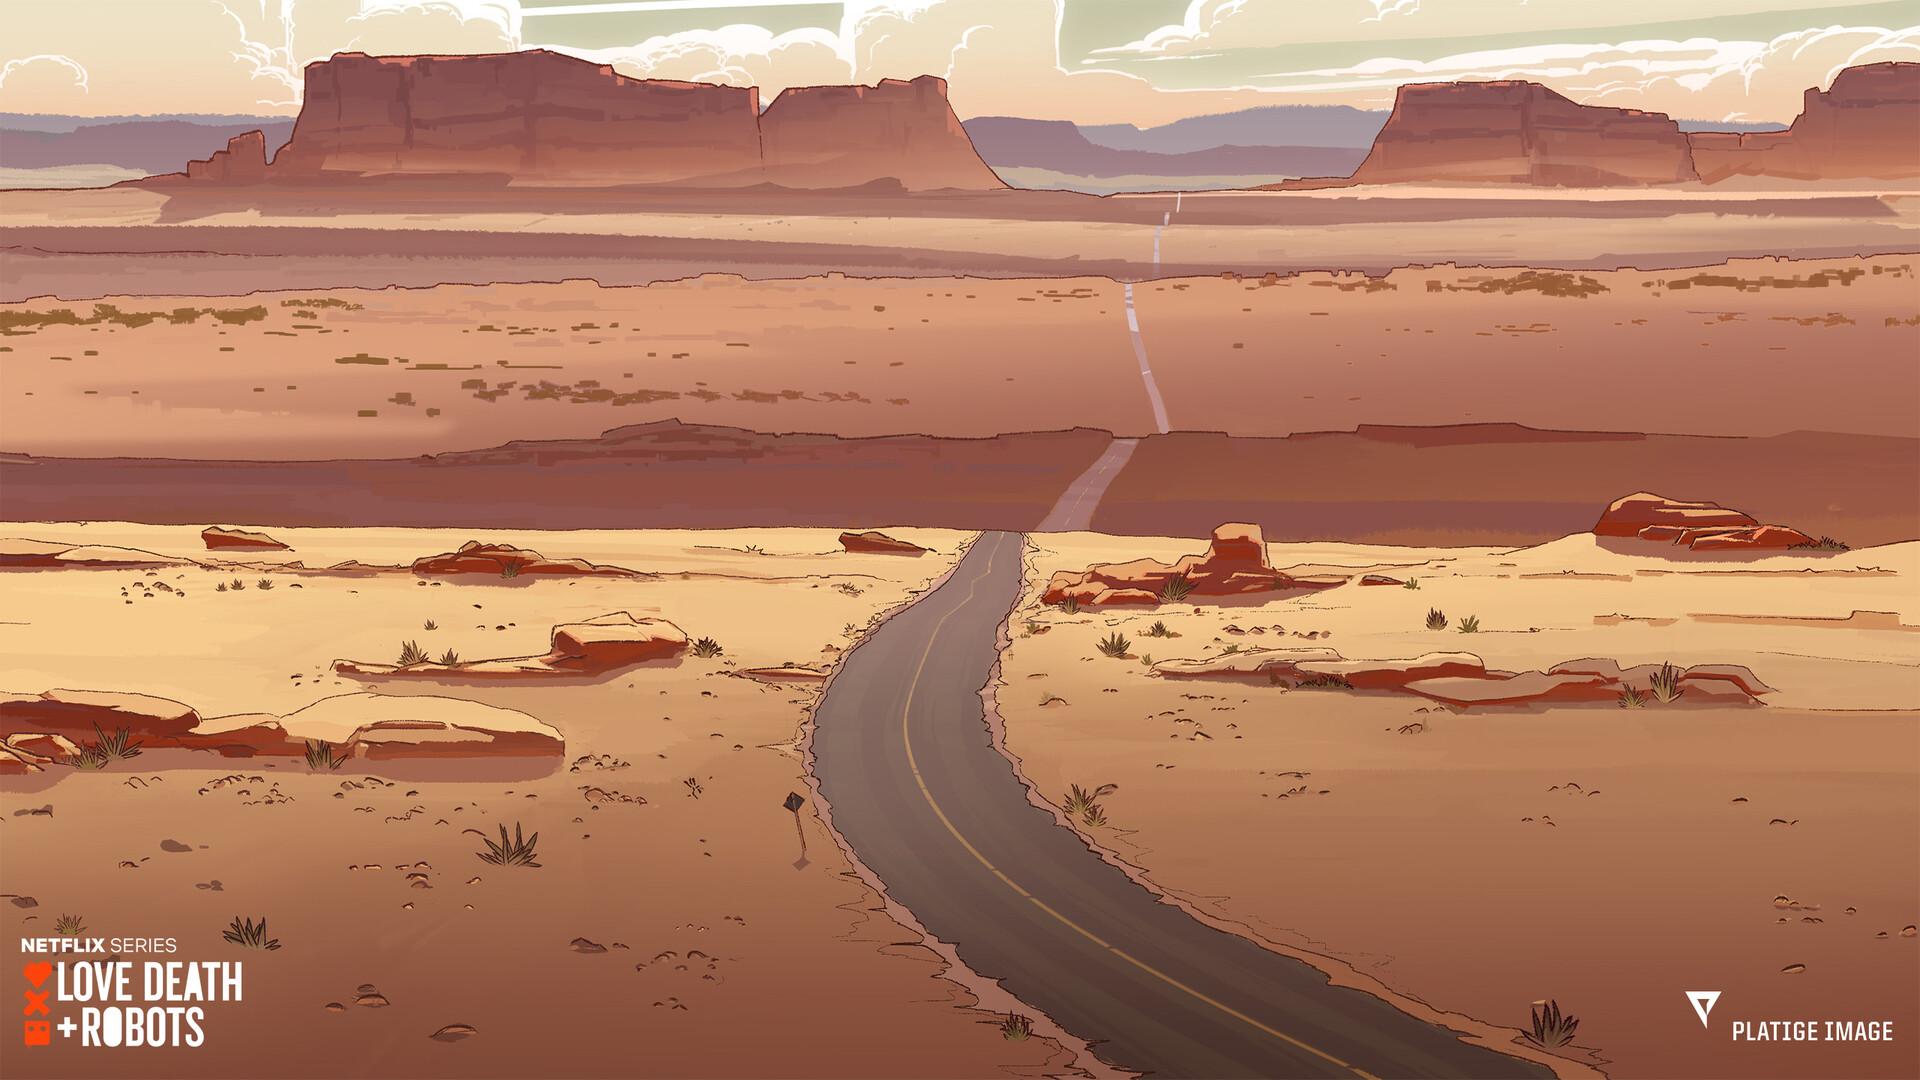 Opening shot background painting